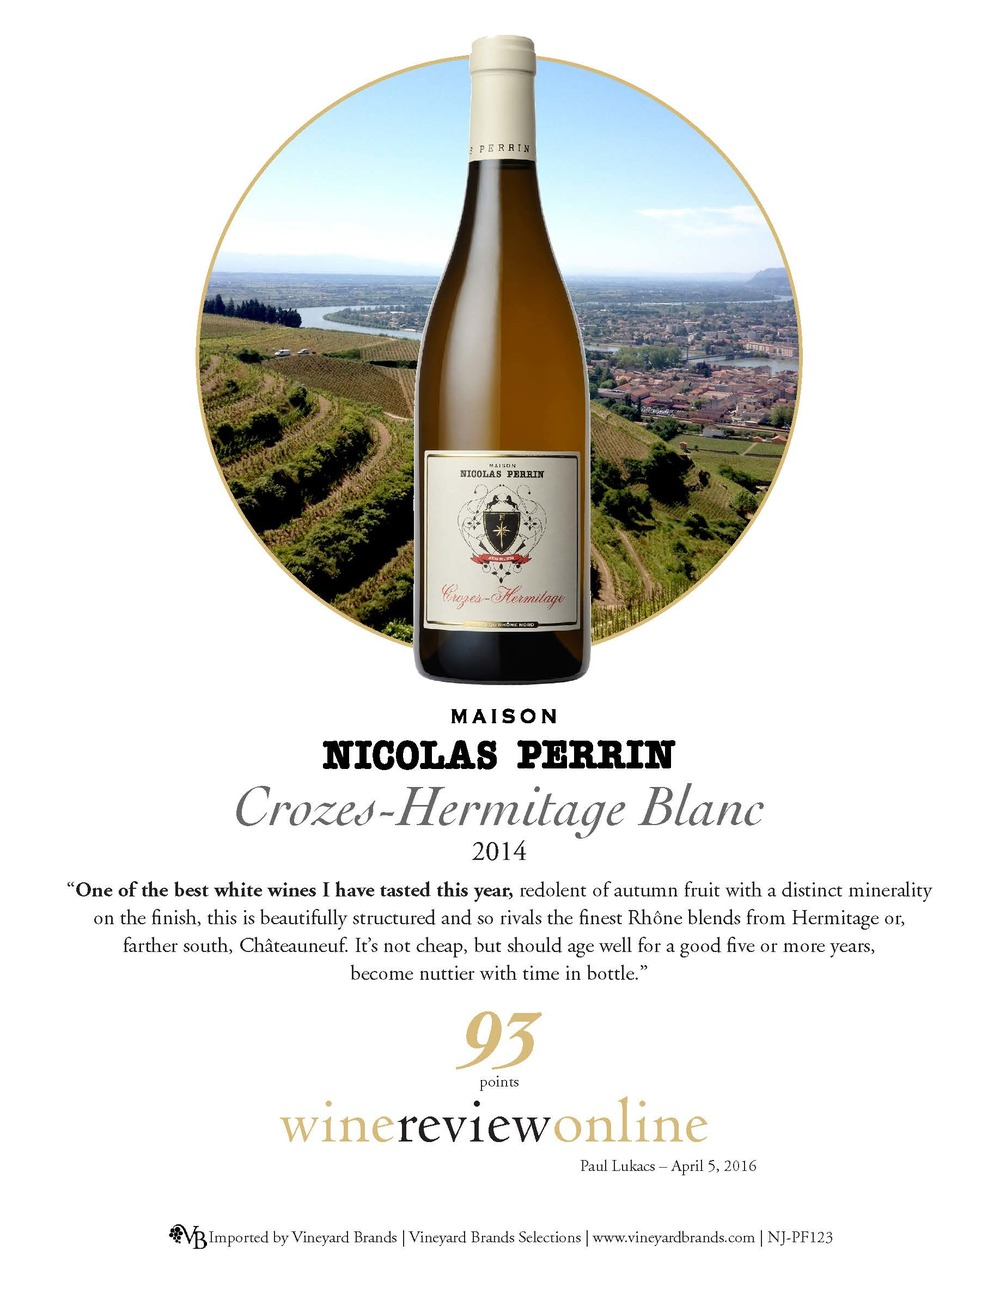 Nicolas Perrin Crozes-Hermitage Blanc 2014